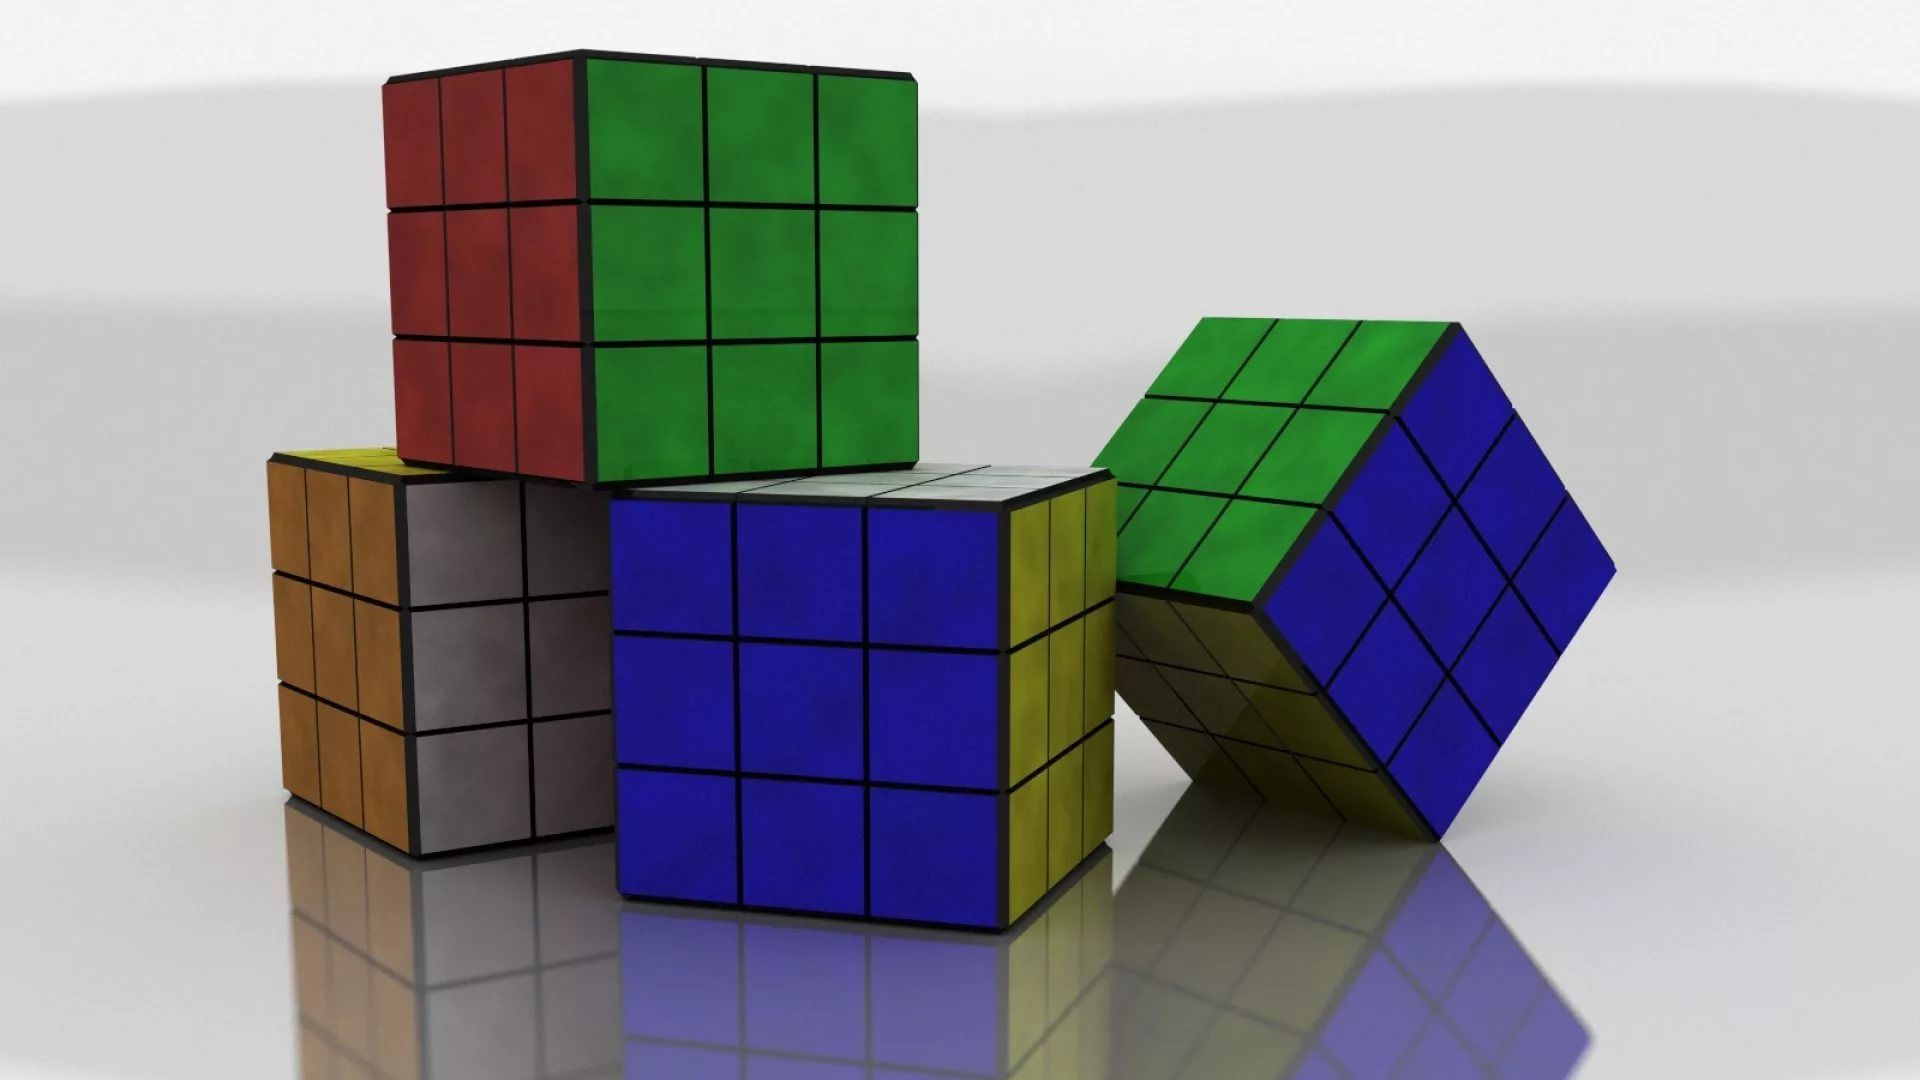 Rubiks Cube free hd wallpaper